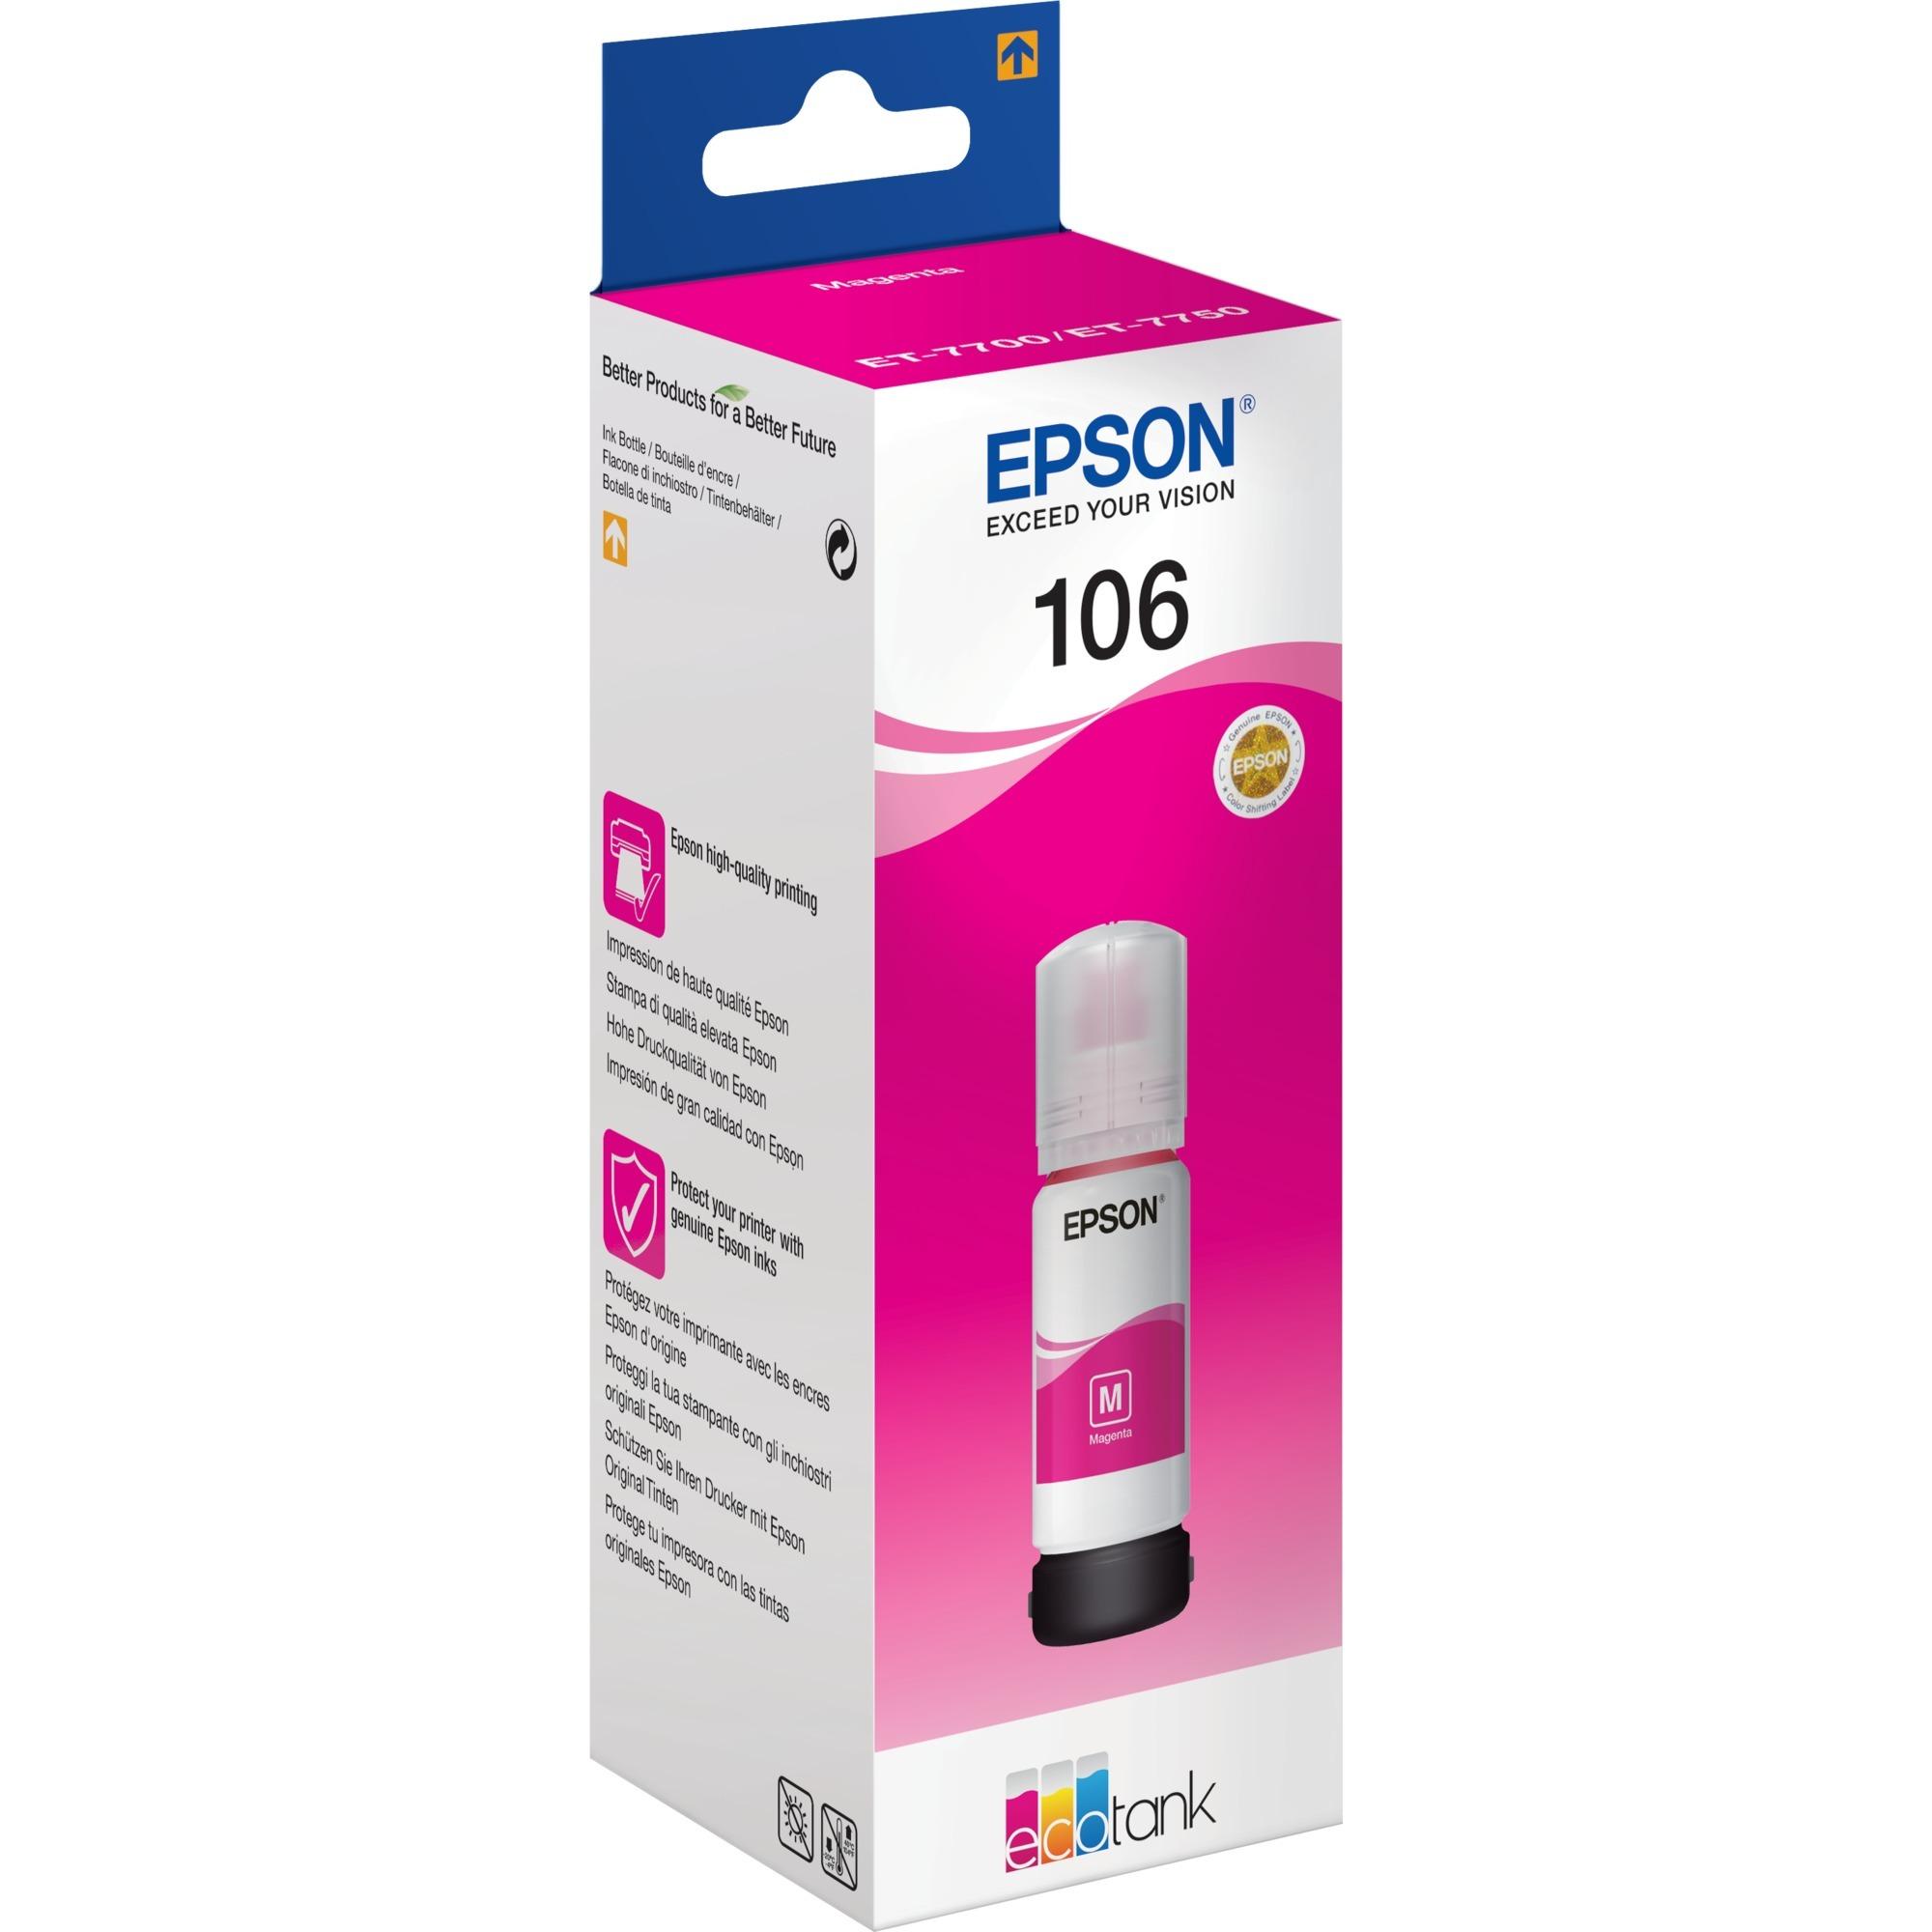 106 EcoTank Magenta ink bottle cartucho de tinta